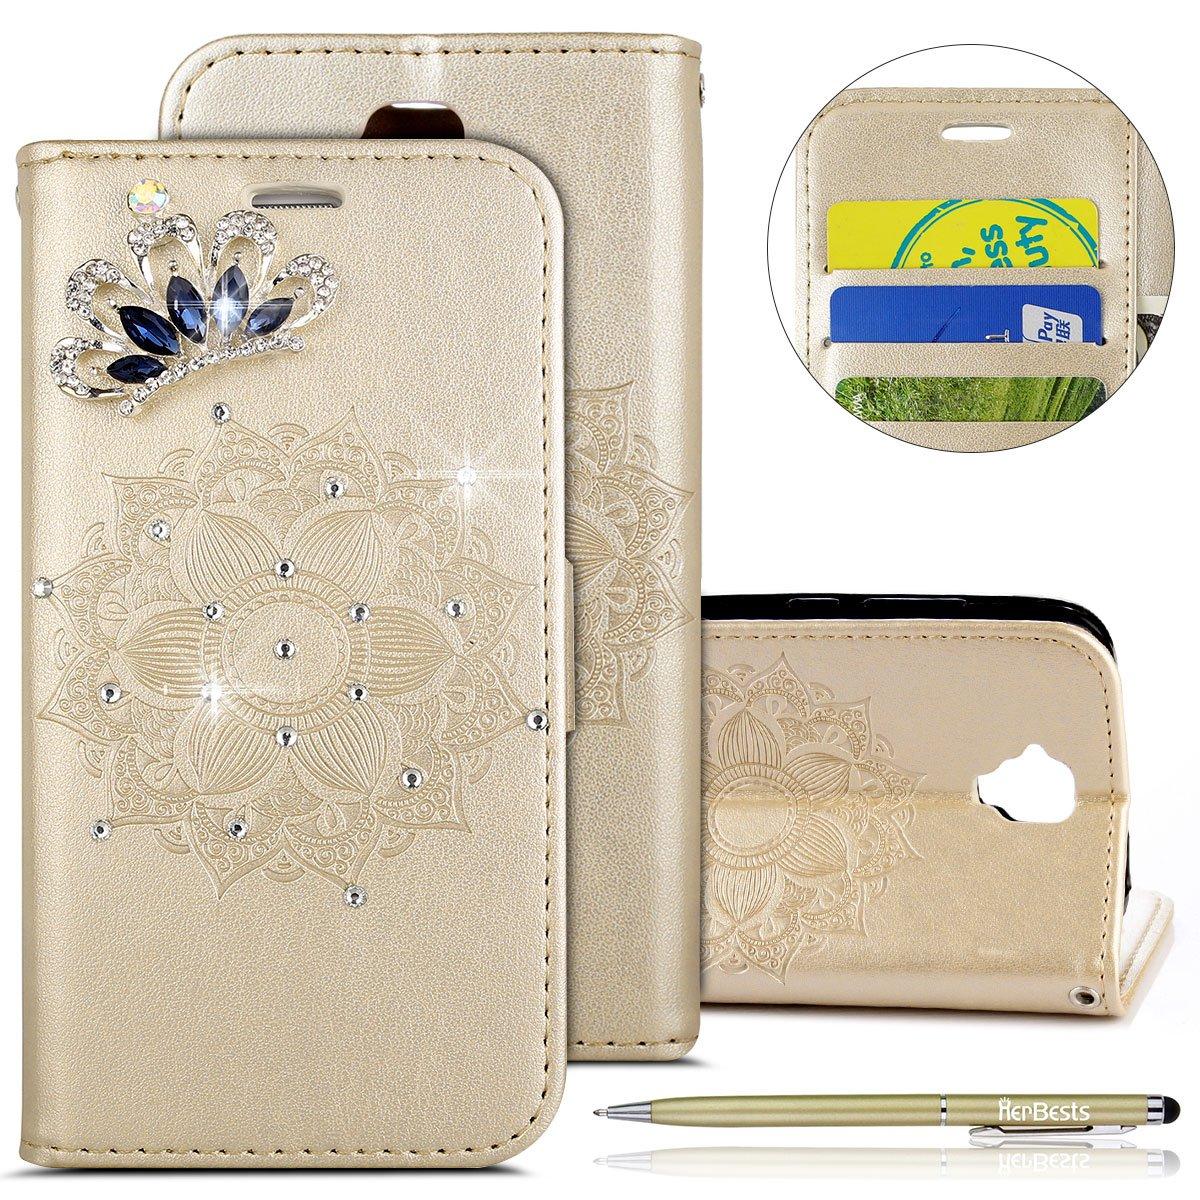 Herbests Kompatibel mit Hülle Huawei Y560 Klapphülle Leder Flip Case Glitzer Bling Strass Diamant Retro Mandala Blumen Muster Handyhülle Ledertasche Schutzhülle Handytasche Lederhülle,Braun